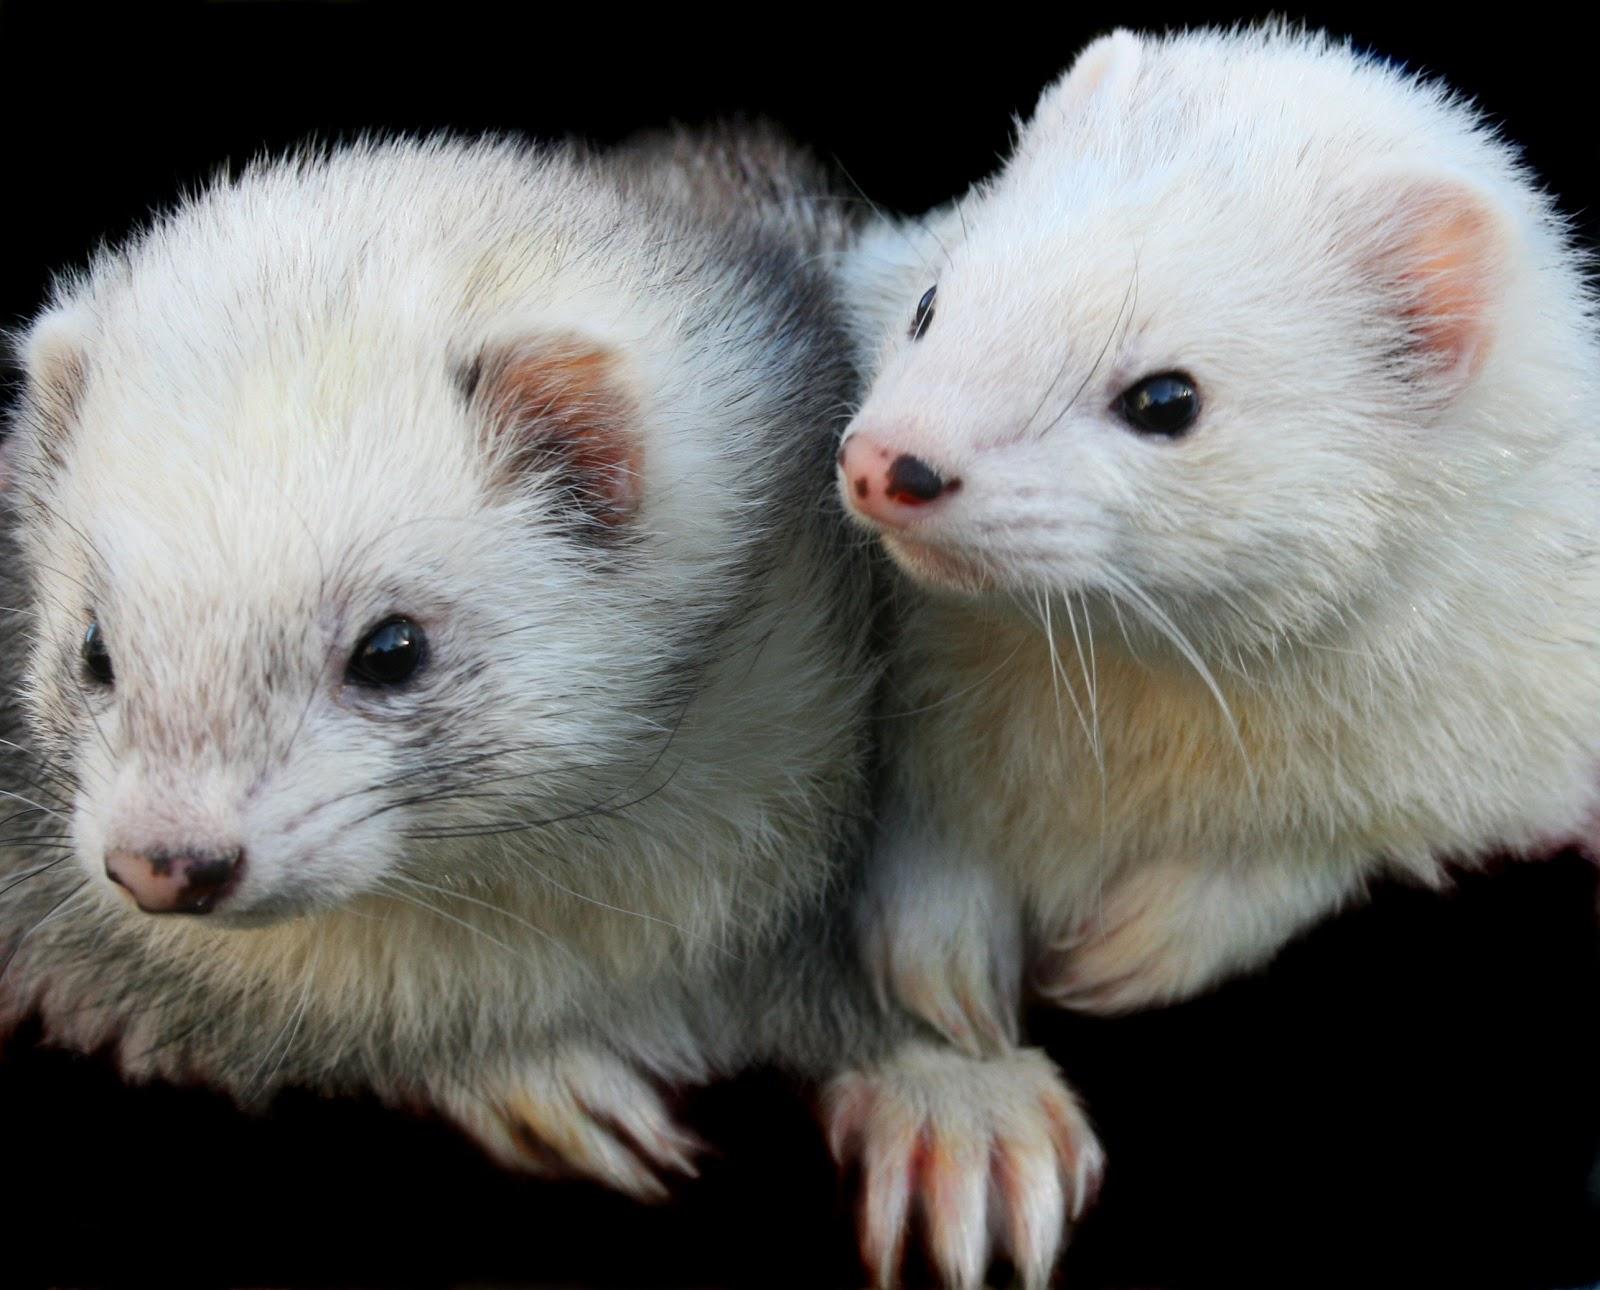 two ferrets